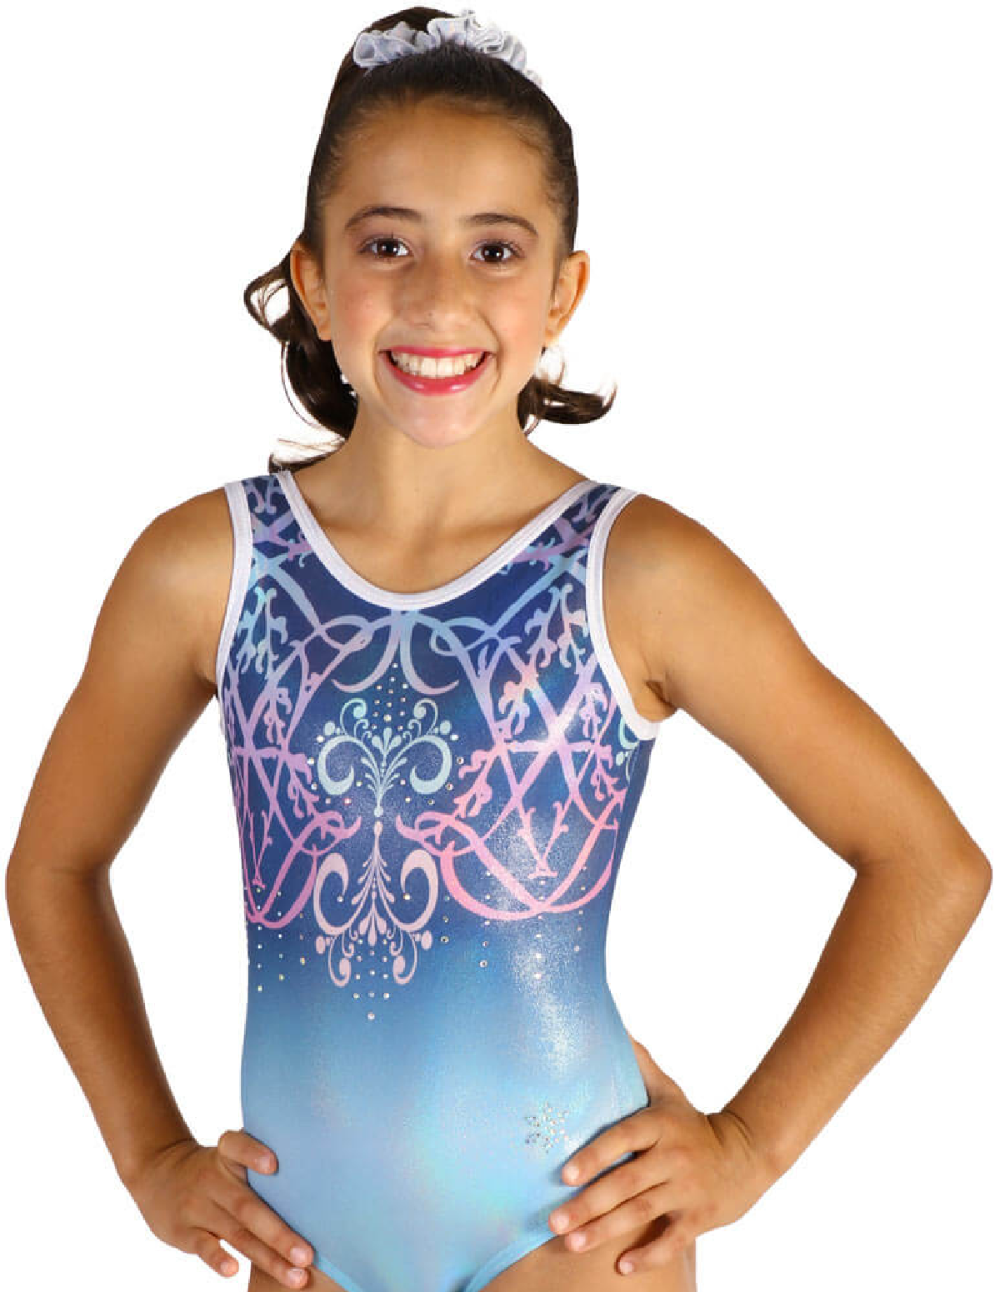 Boys Gymnast Singlet Black Blur Abstract Gymnastics Child Medium only